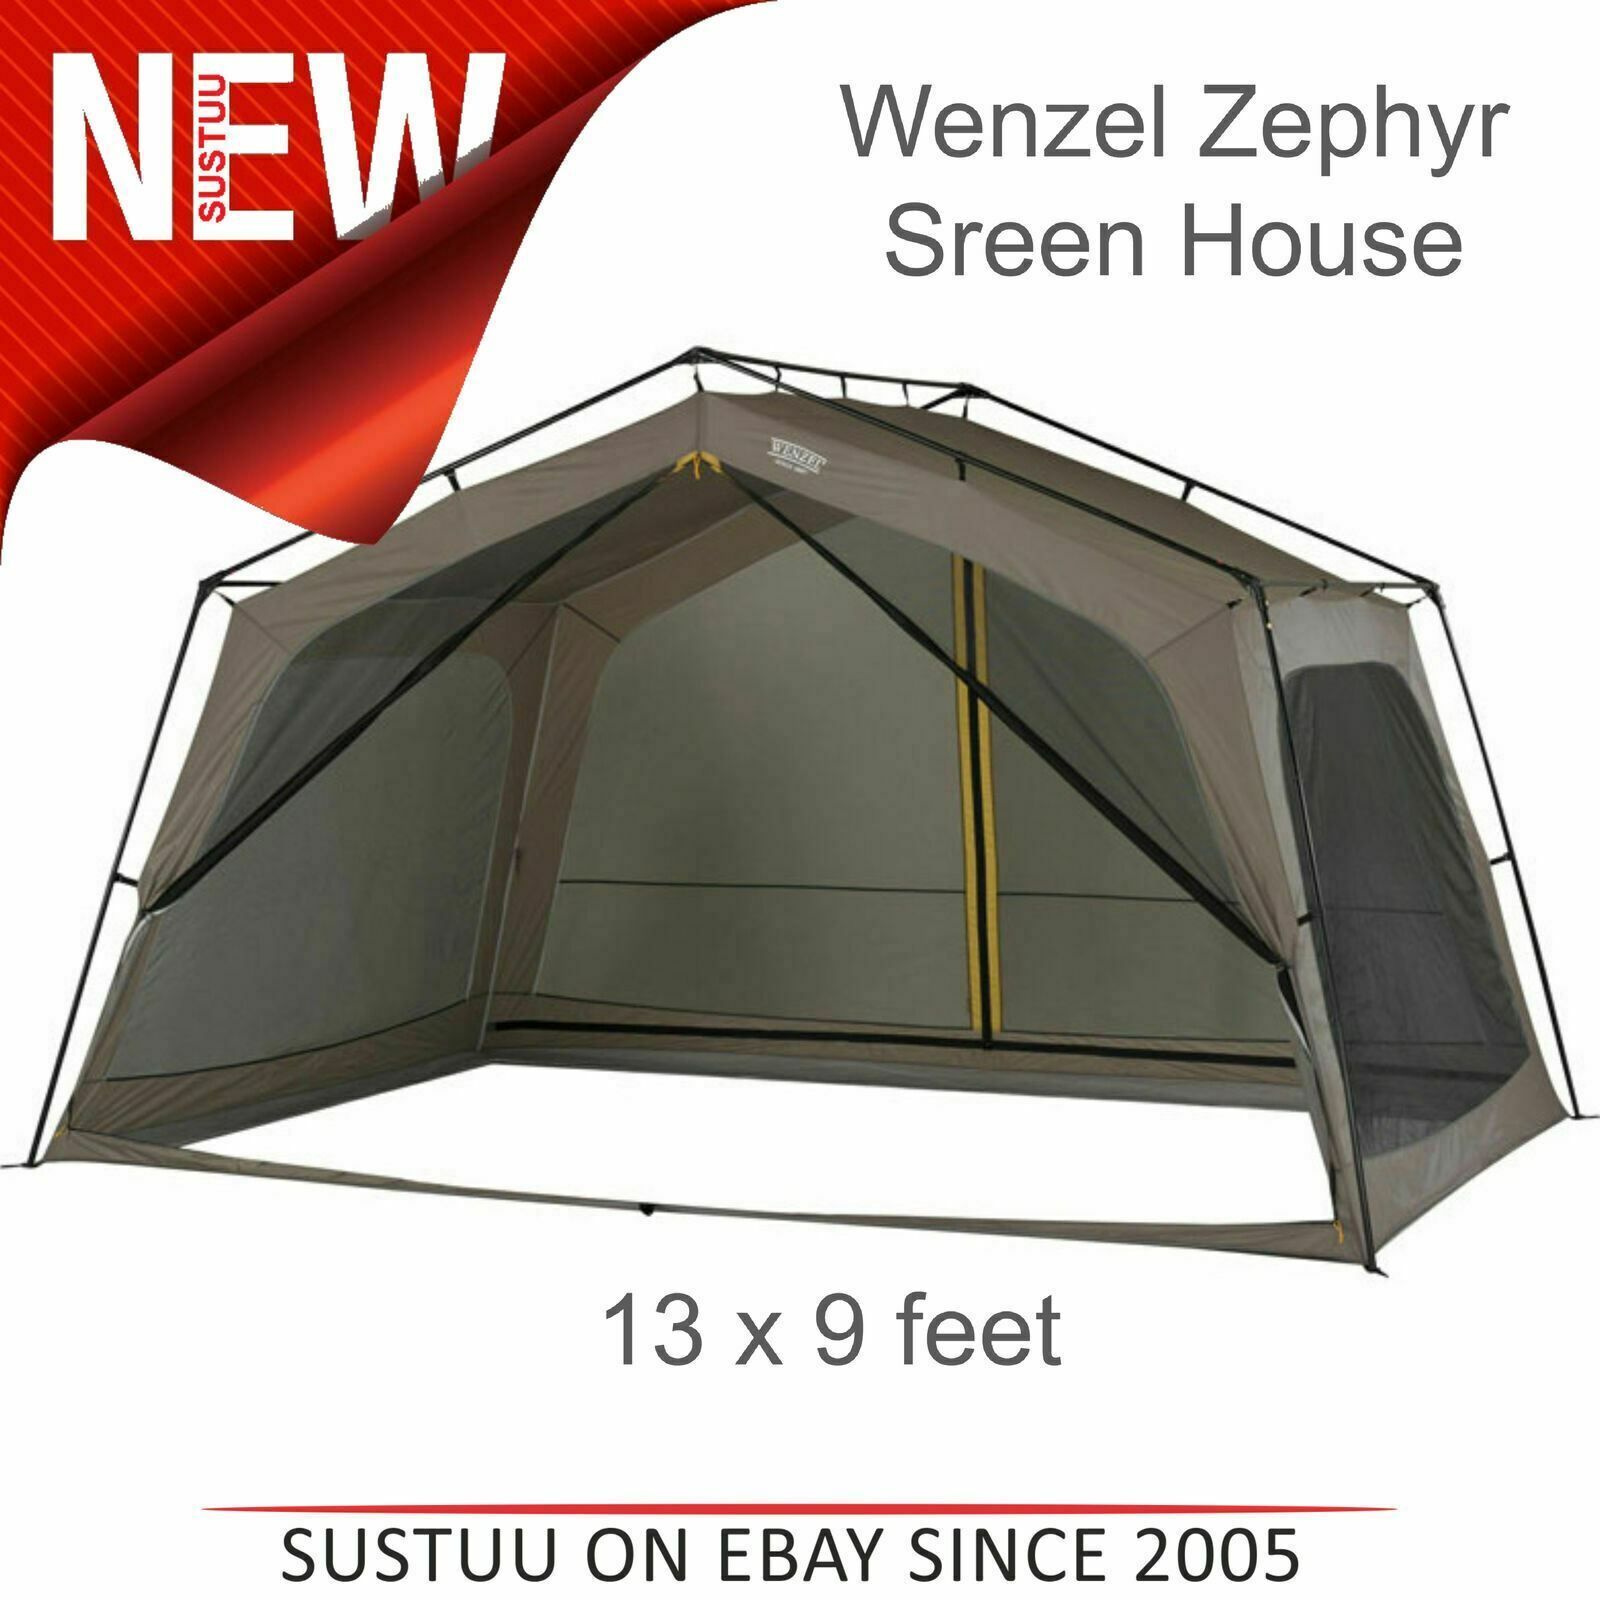 Wenzel 36514 Zephyr all'aperto Schermo Casa Tenda 13x9 FT   SUN SHELTER L5   T porte